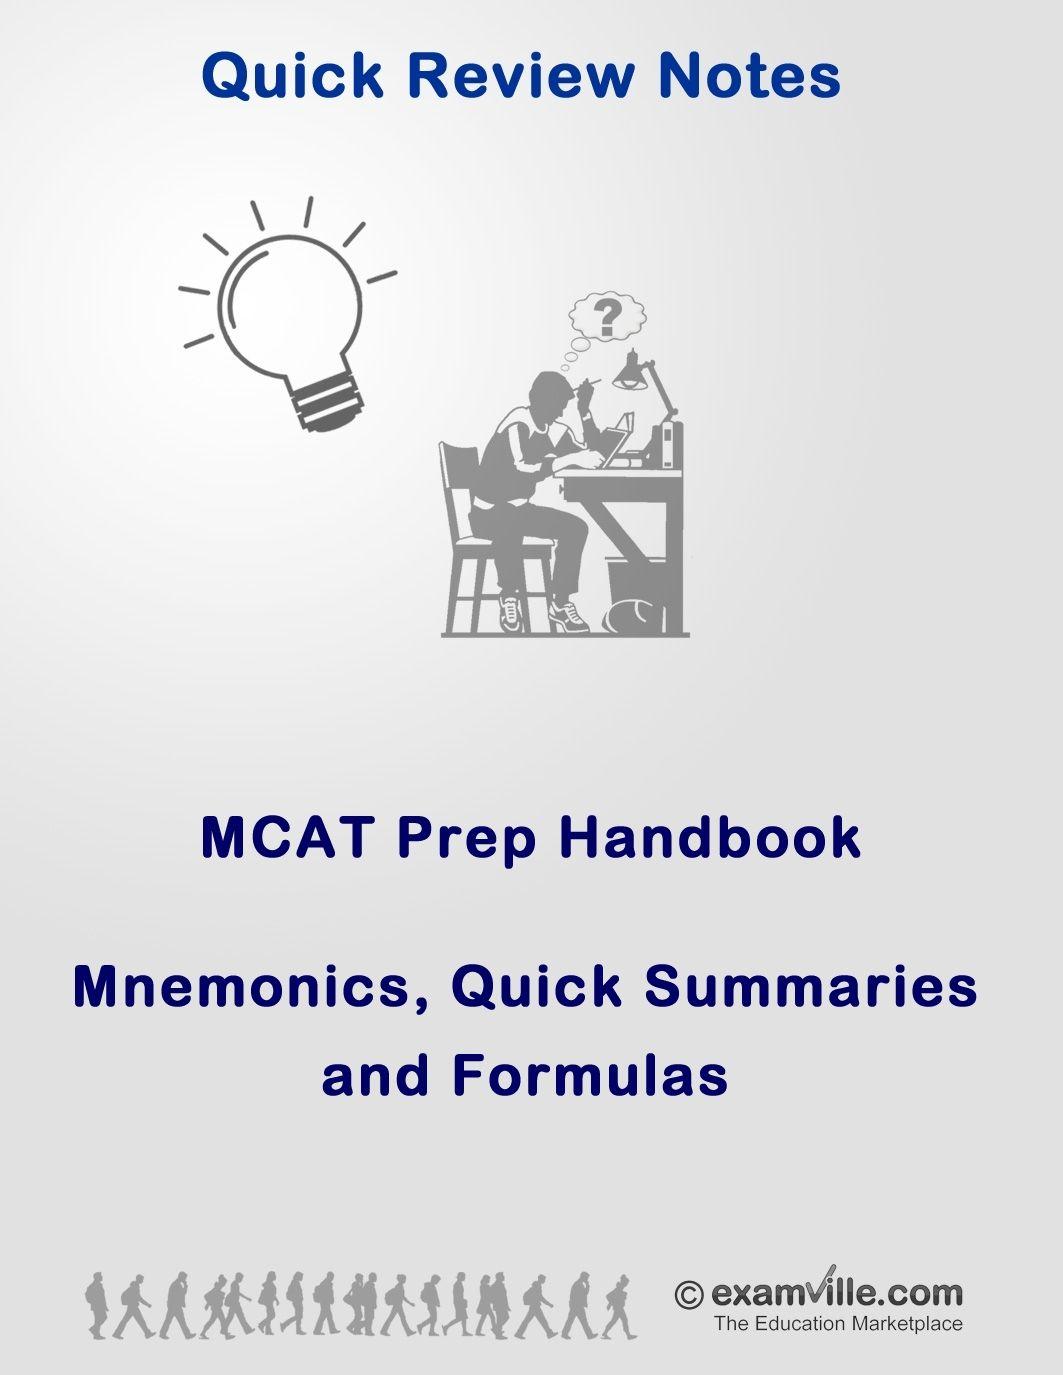 MCAT Handy Prep Handbook